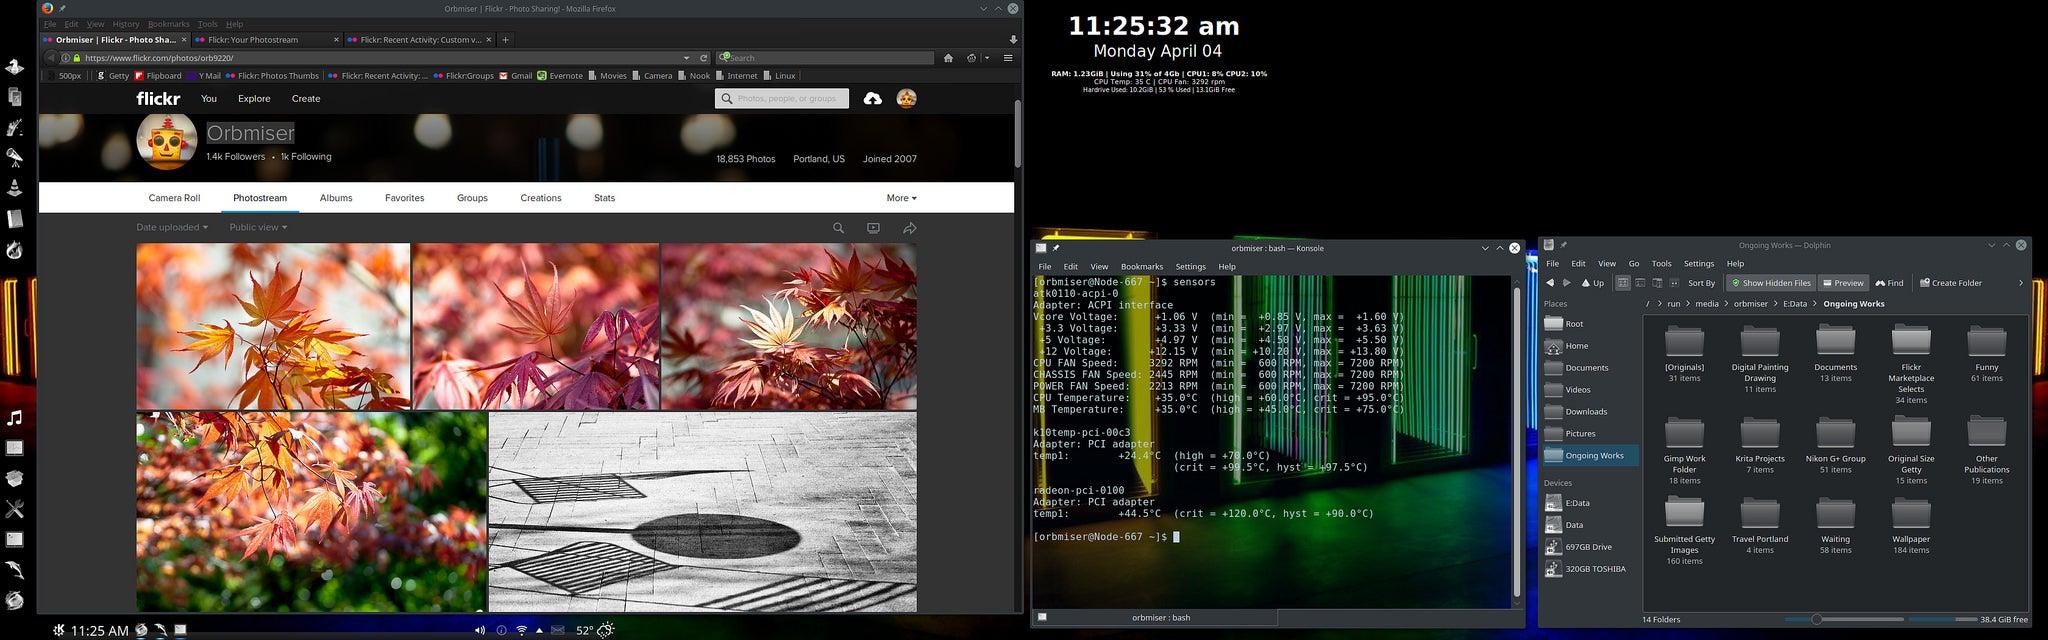 The Mirrored Colour Dual-Monitor Desktop